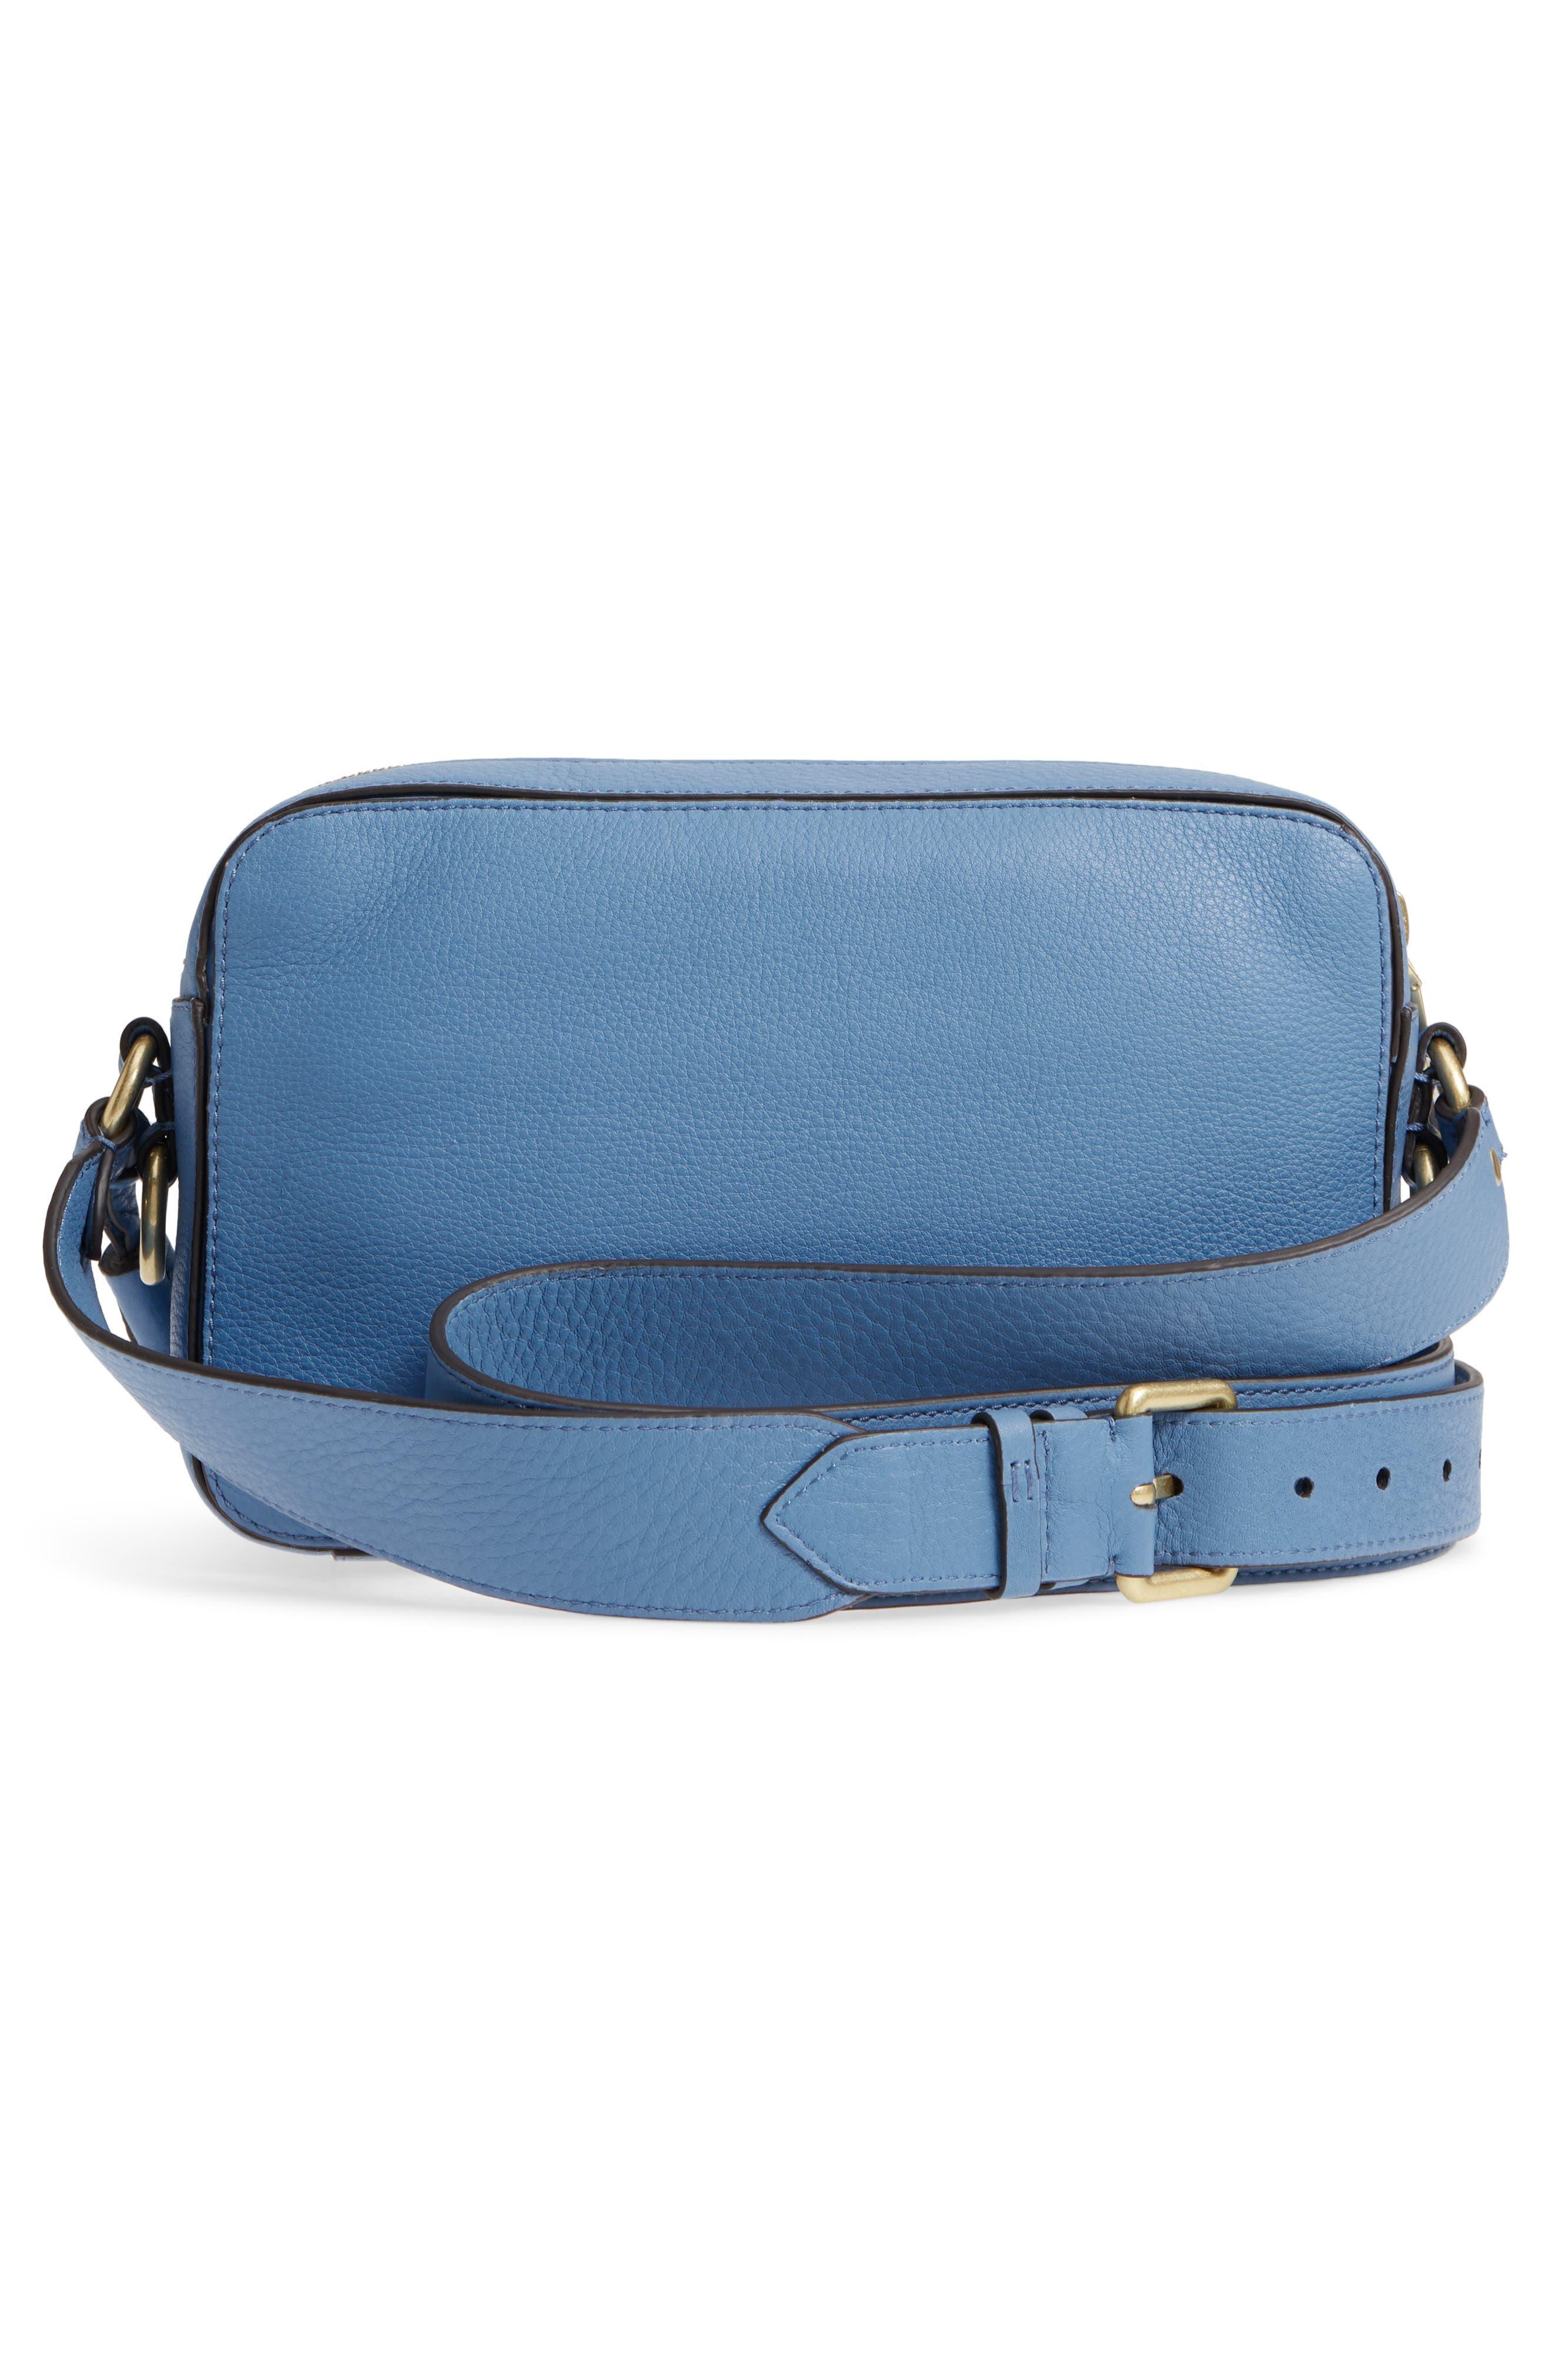 Cassidy RFID Pebbled Leather Camera Bag,                             Alternate thumbnail 5, color,                             Riverside